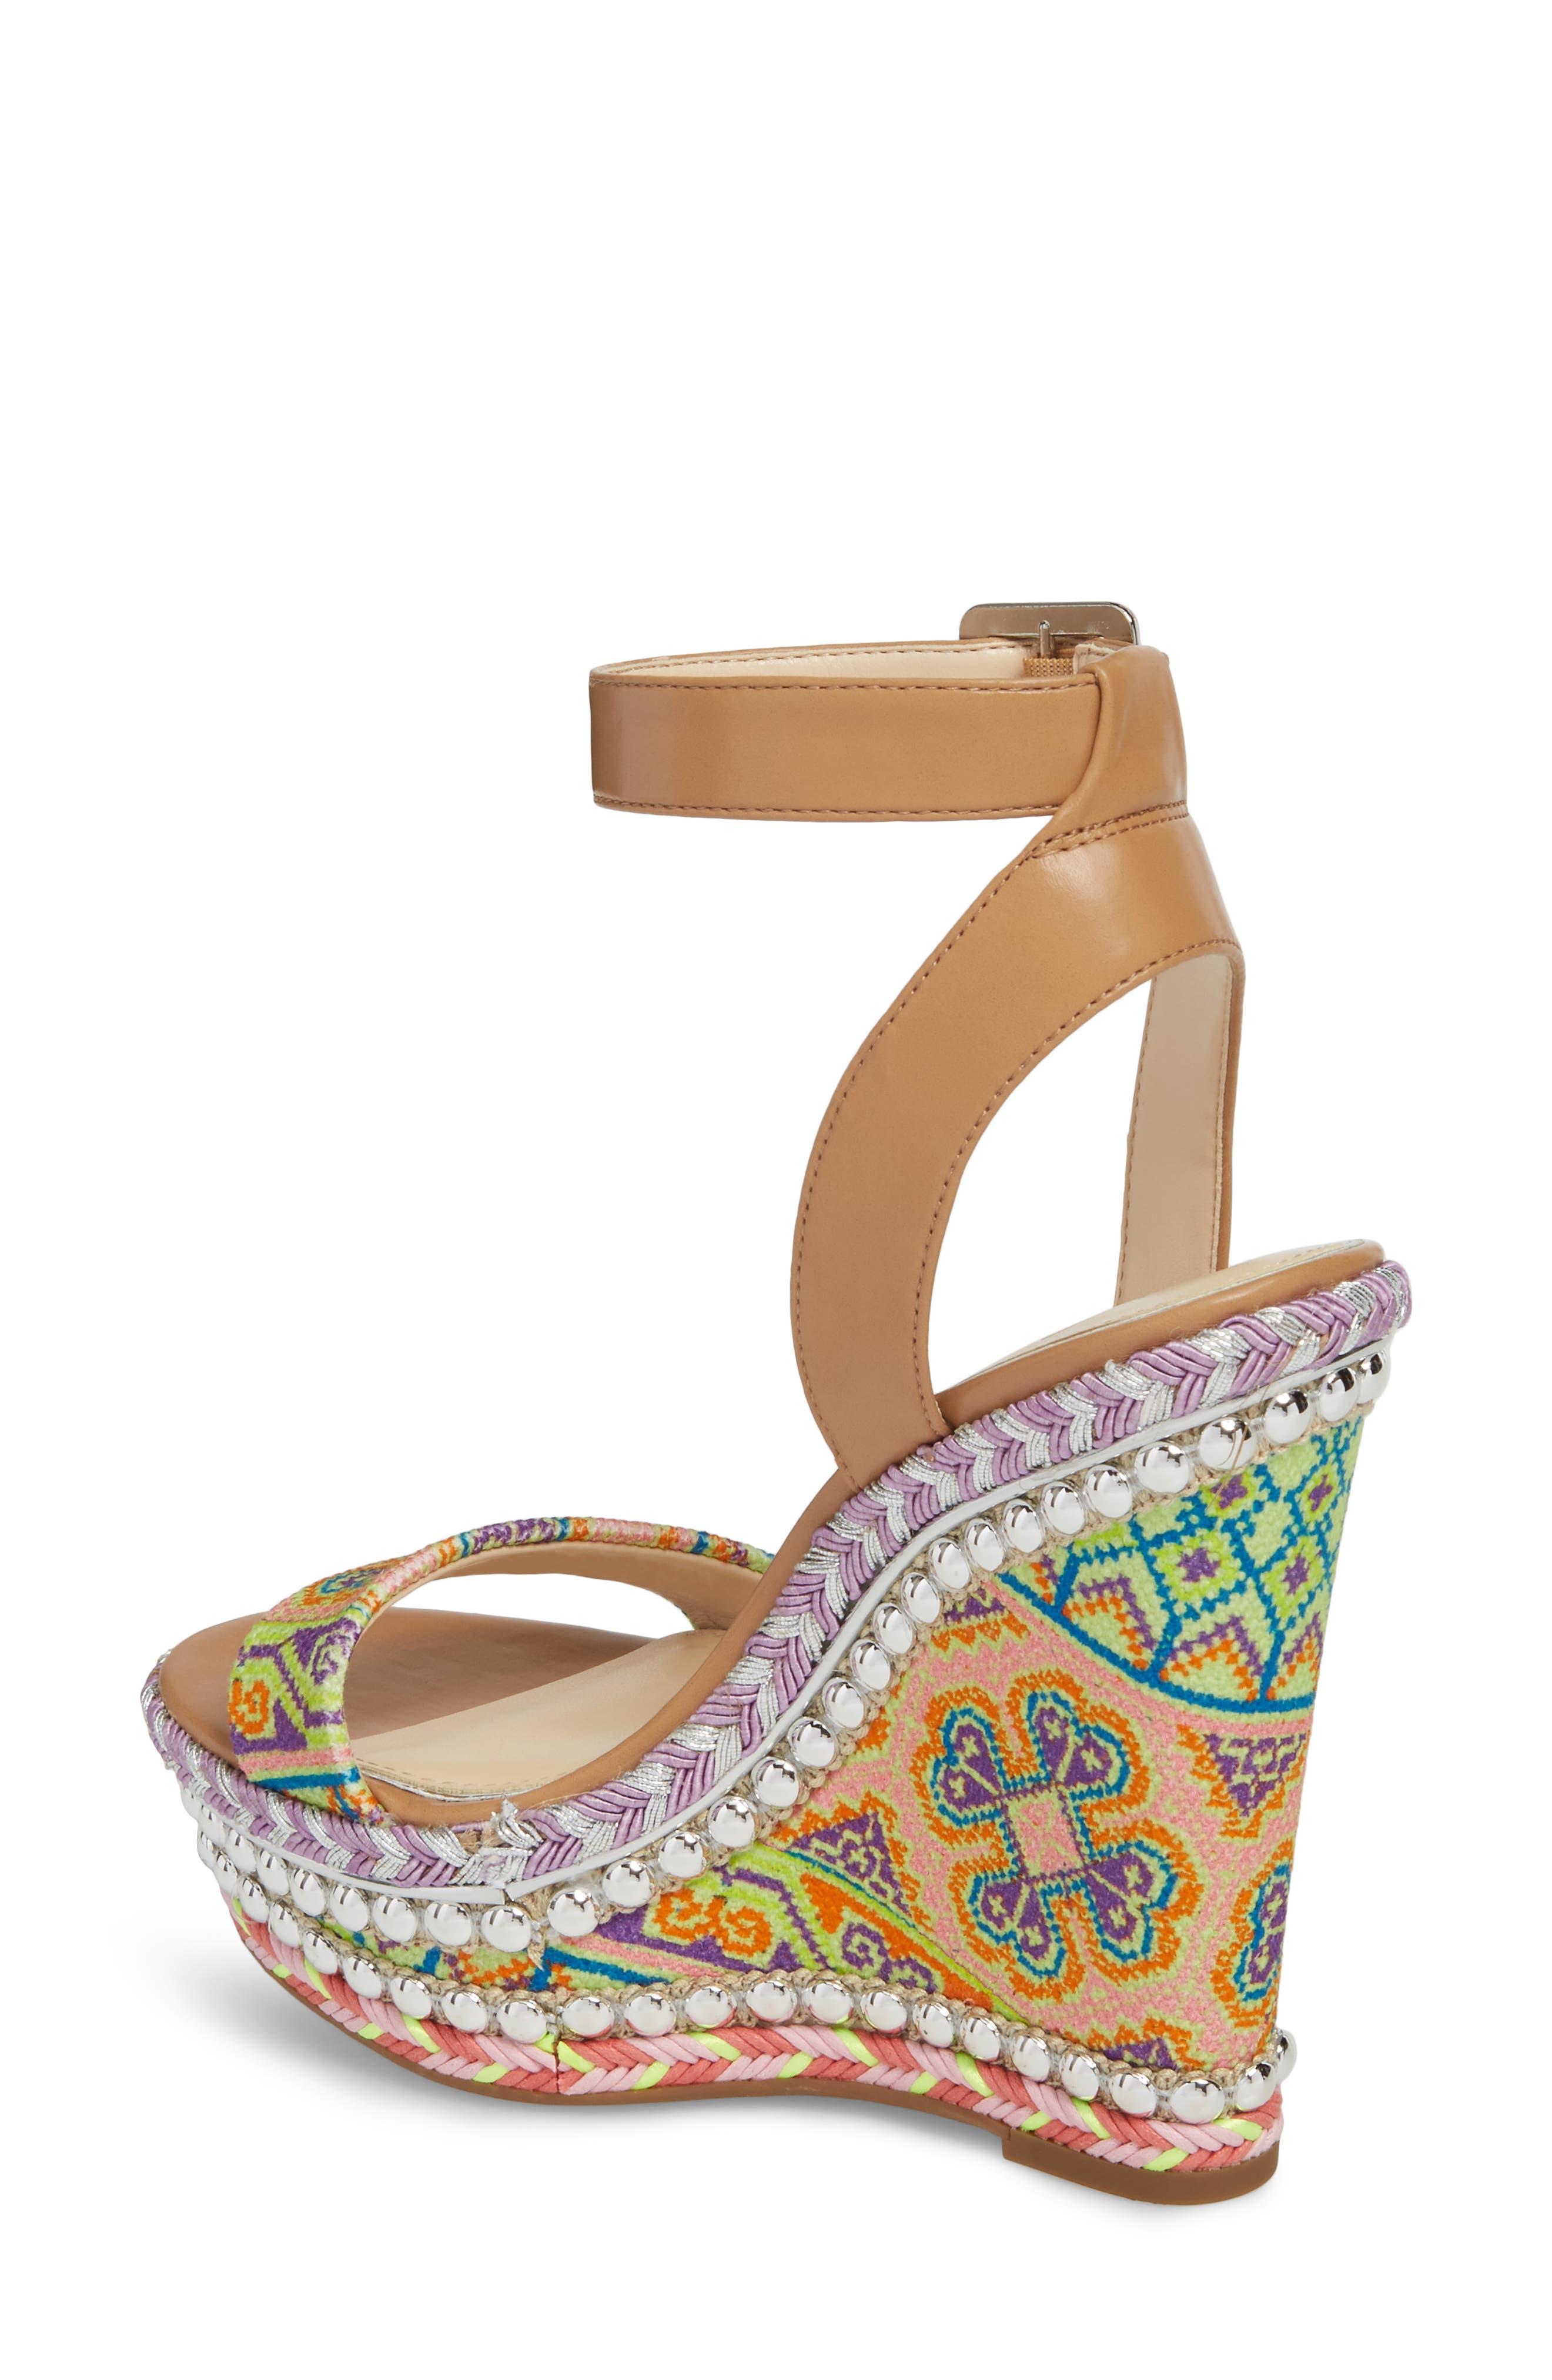 Alinda Embellished Wedge Sandal,                             Alternate thumbnail 2, color,                             320